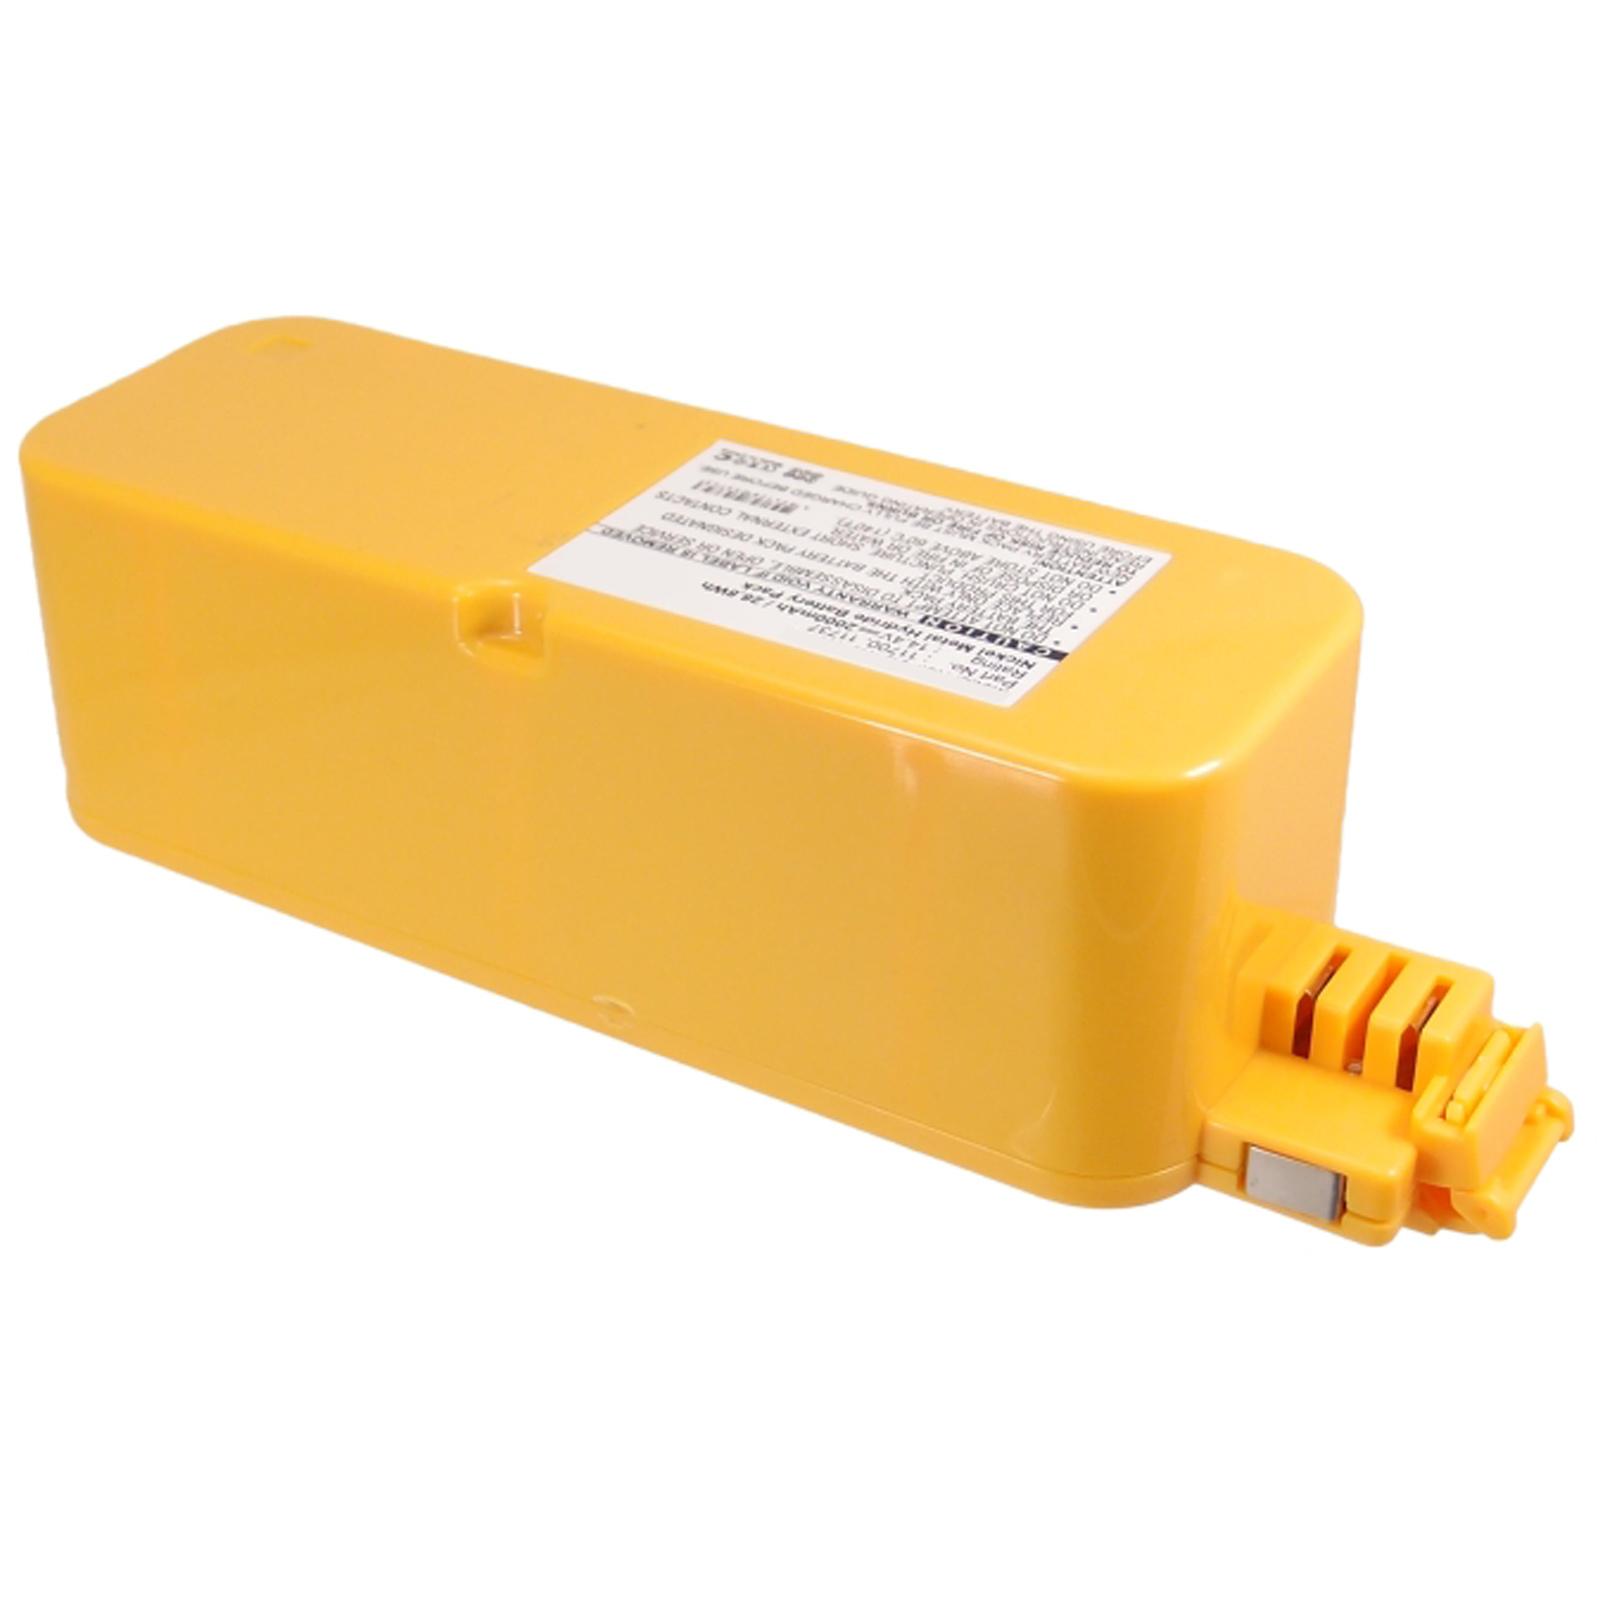 14 4v vacuum battery for irobot 11700 17373 discovery floorvac roomba usa ship ebay. Black Bedroom Furniture Sets. Home Design Ideas